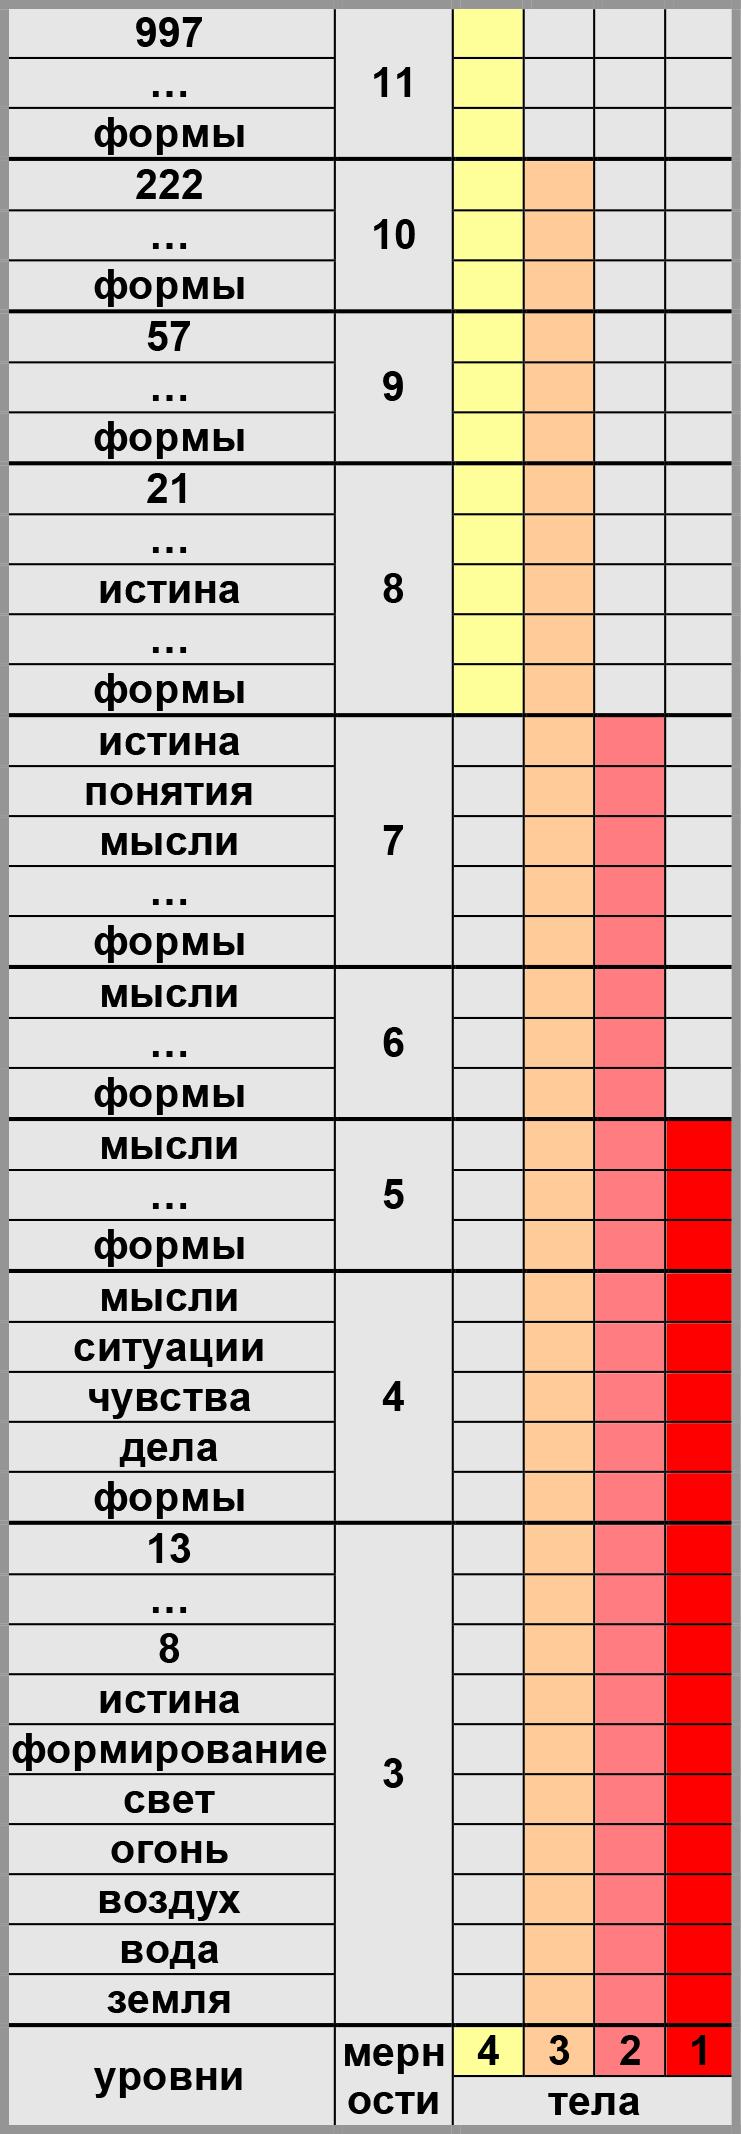 Уровни мерности 3-11